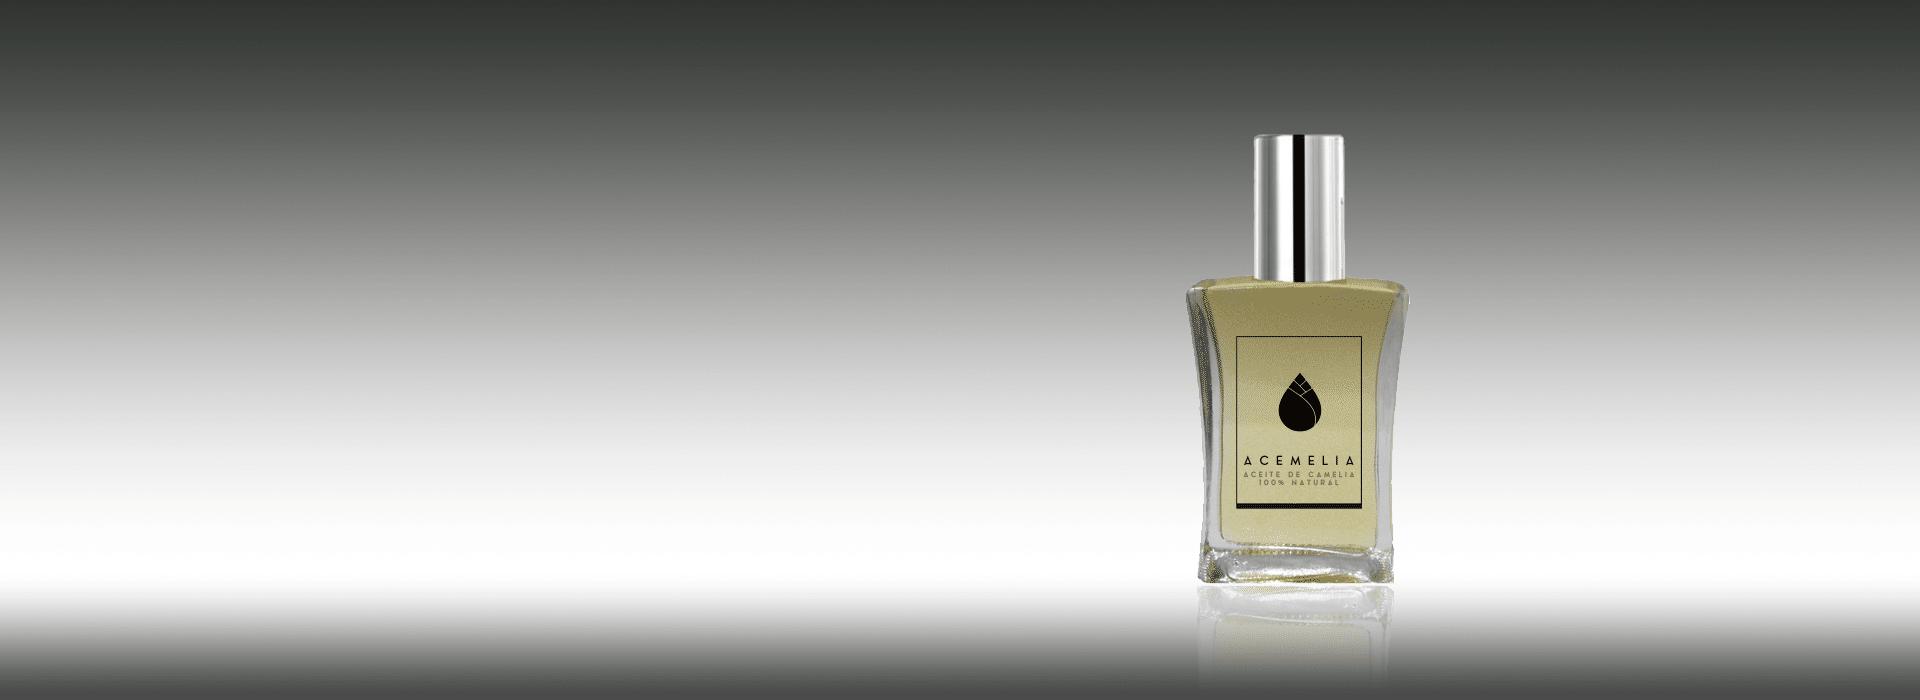 camellia oil acemelia